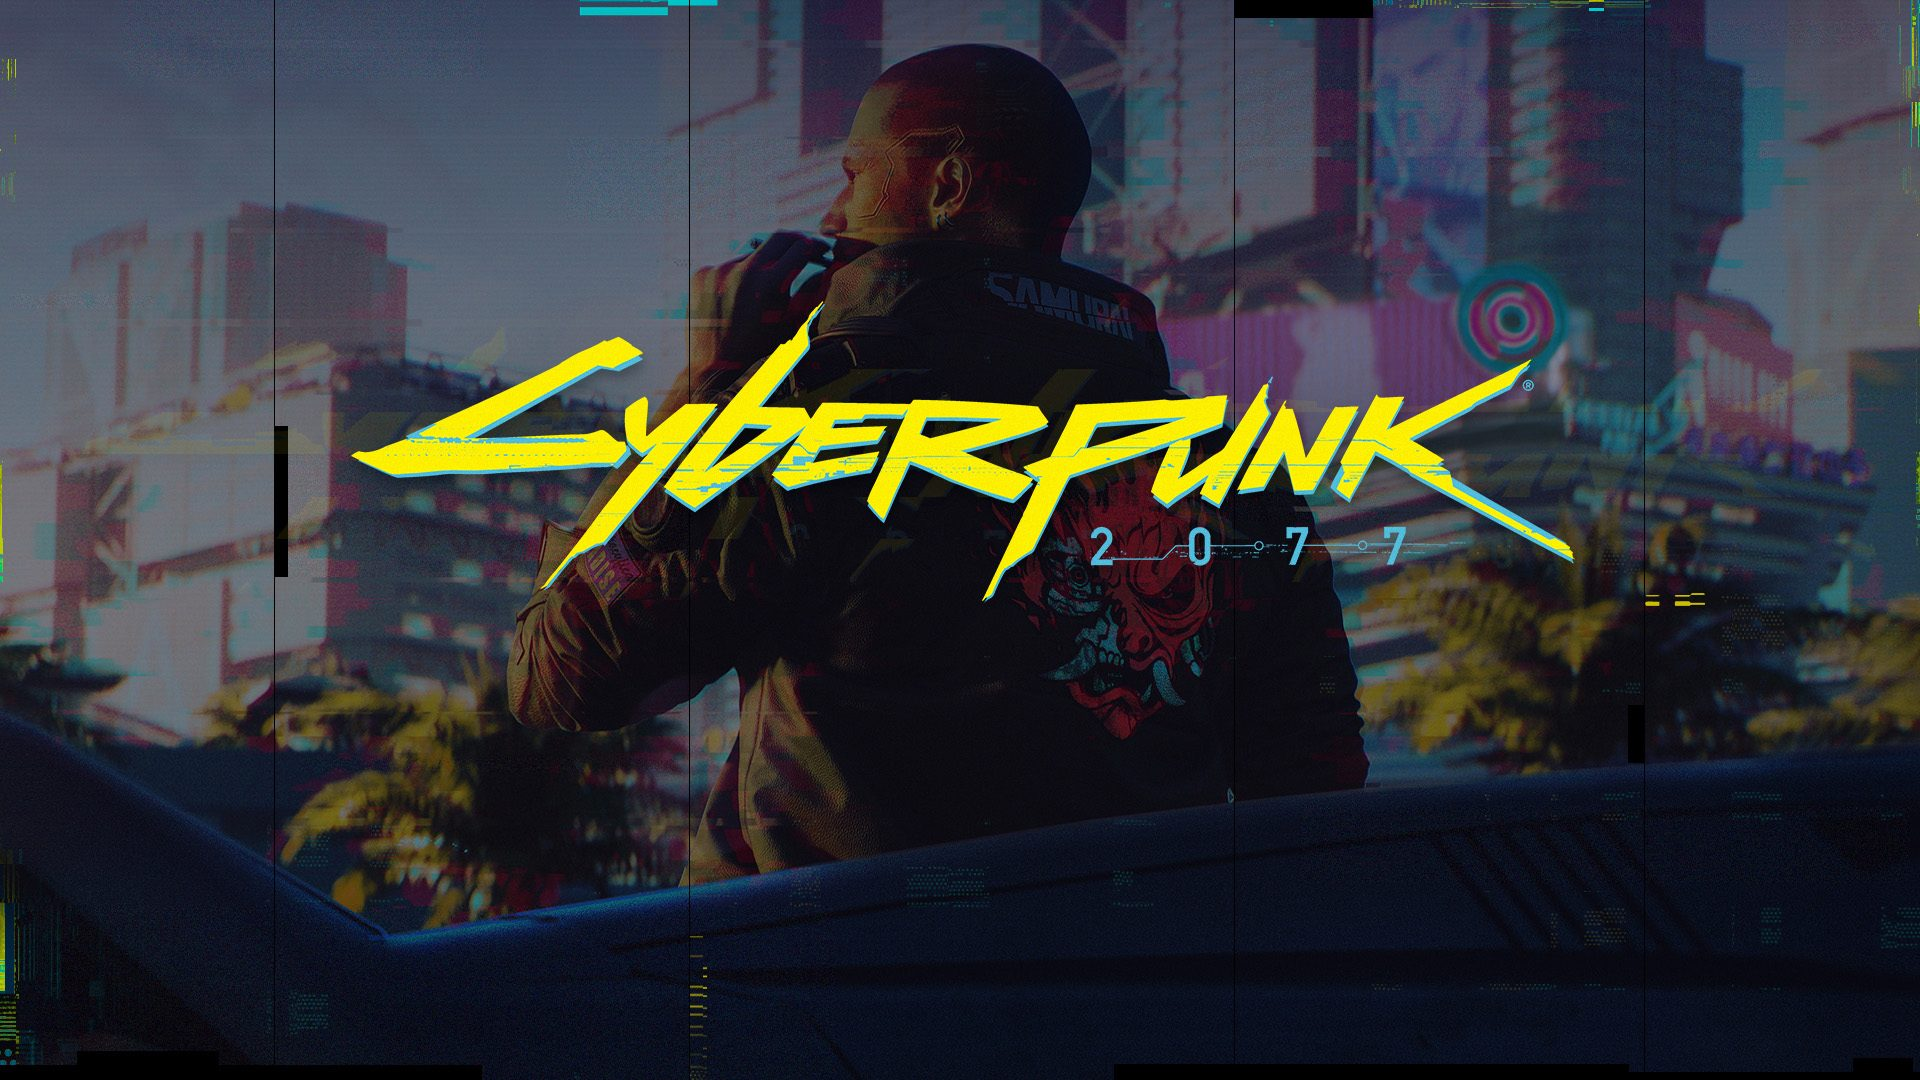 How do I install Cyberpunk 2077?